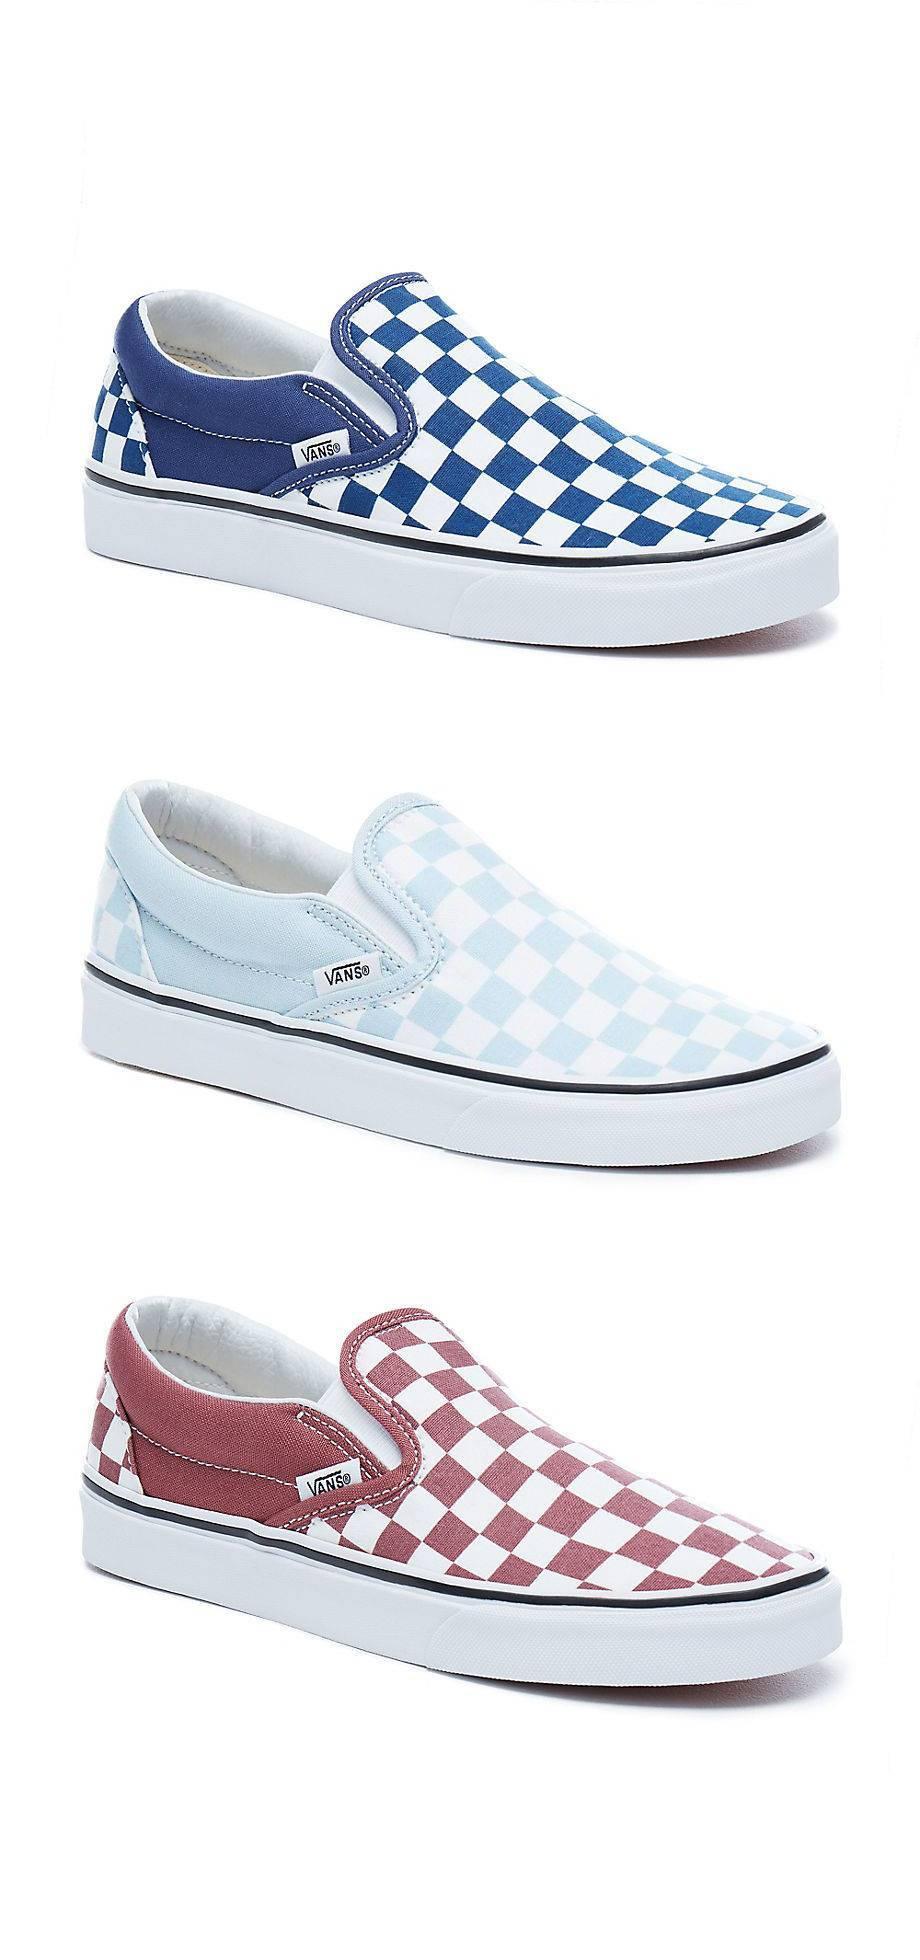 VANS Classic Slip-On Low-Cut Sneaker Freizeitschuhe Canvas Textil Schuhe